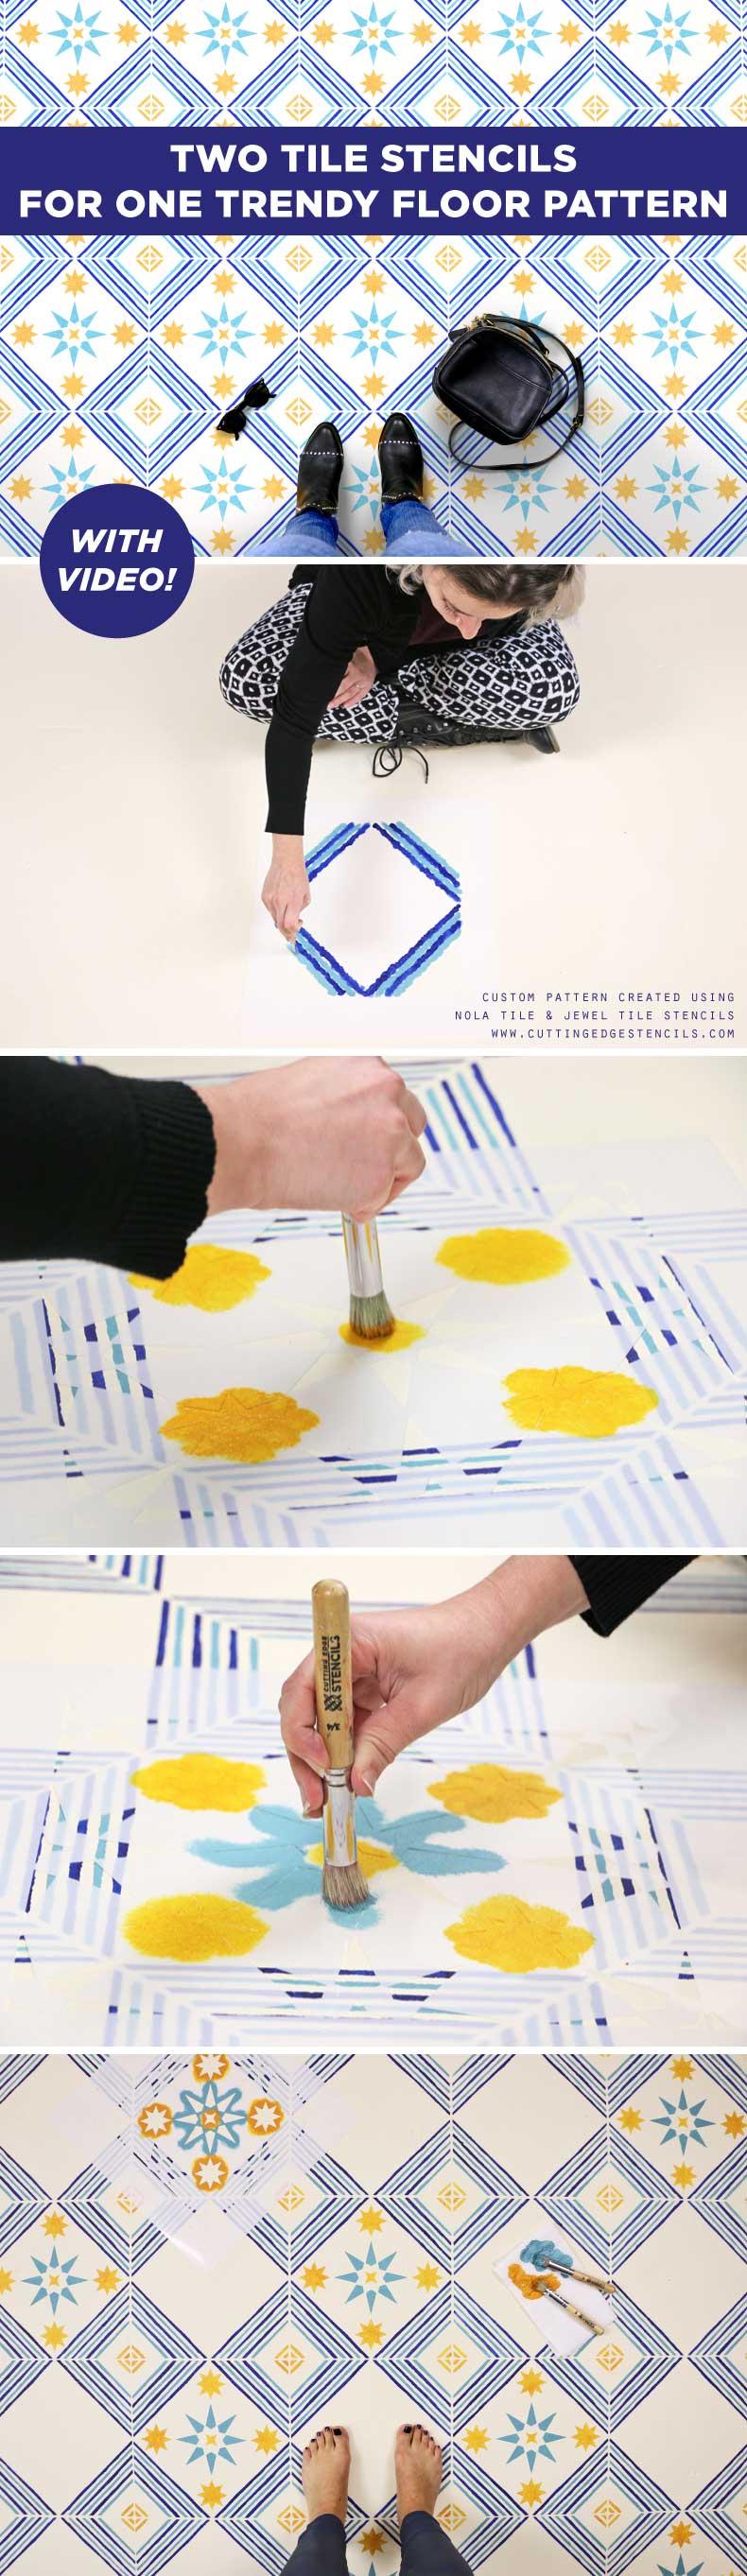 Tile Stencil Pattern for Trendy Floor